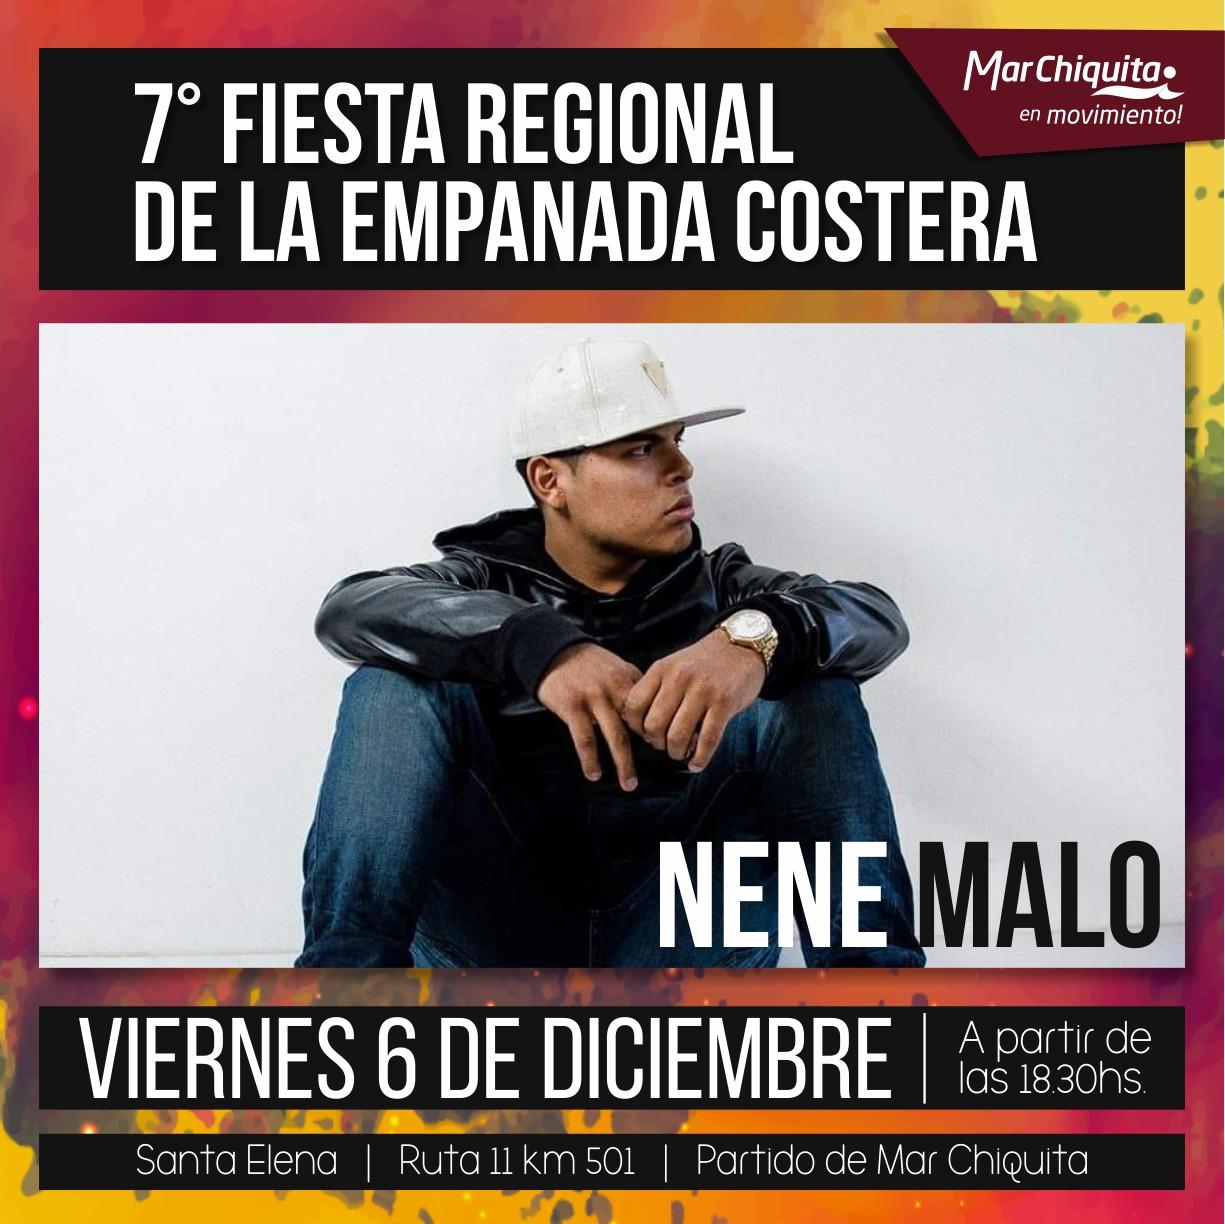 Con NENE MALO como artista principal llega la 7ma Fiesta Regional de la Empanada Costera